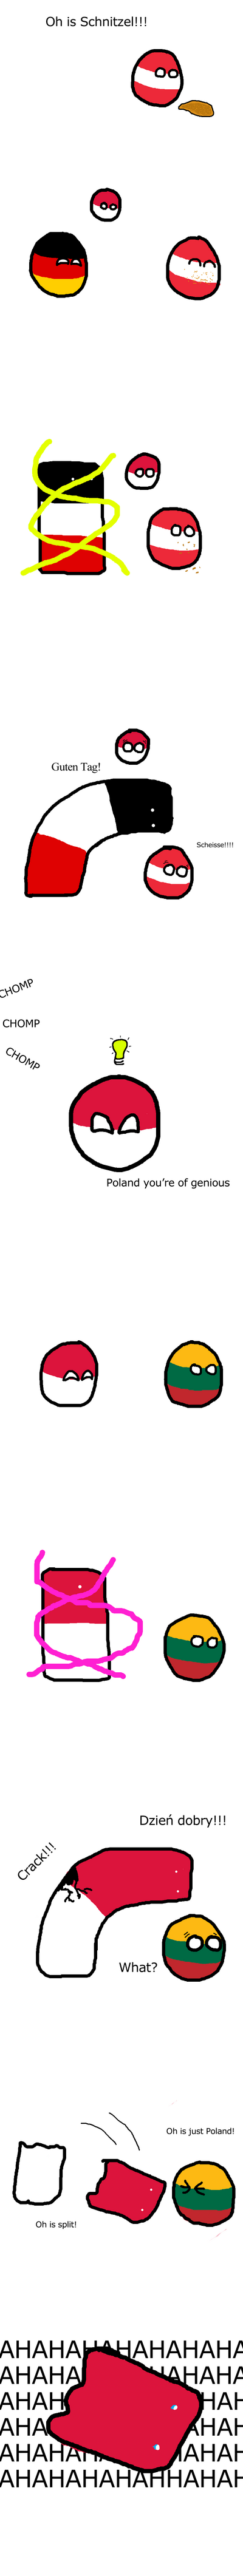 Reddit Amsanc Anczluss!